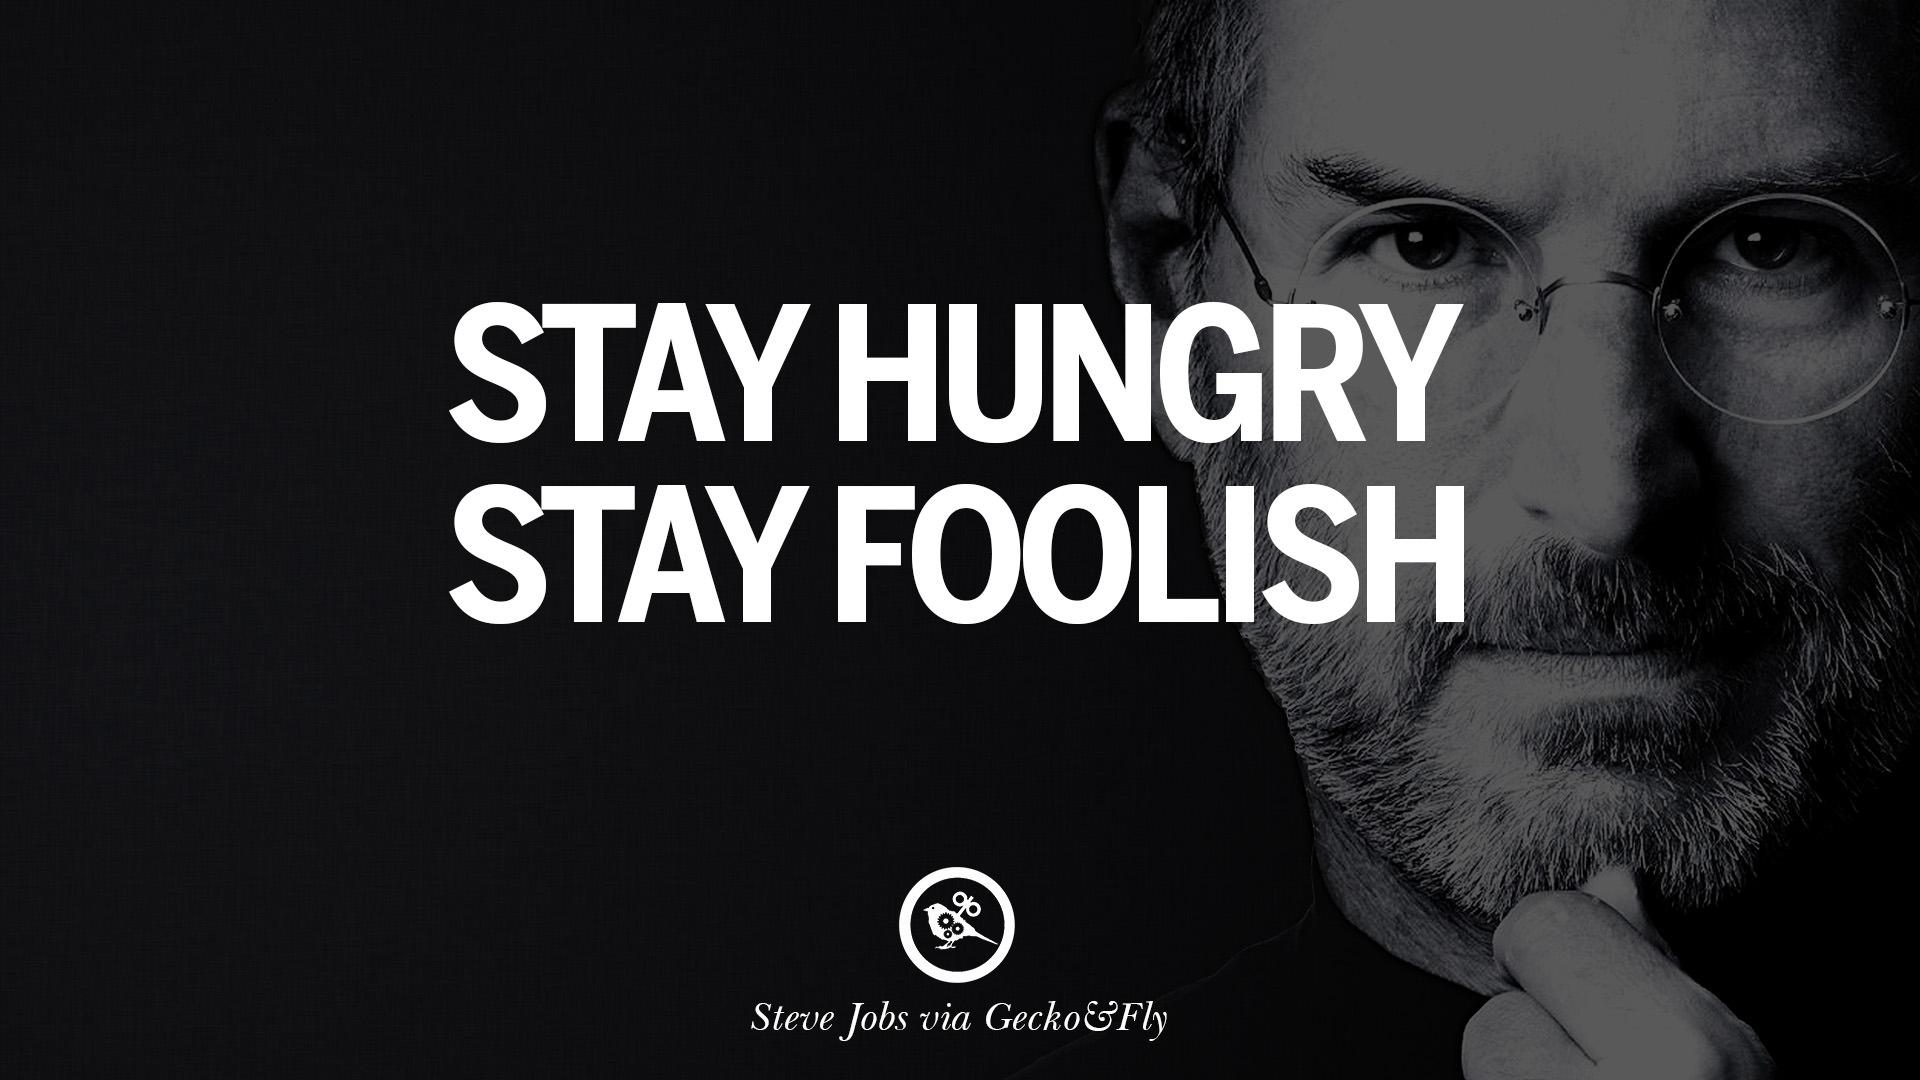 Girl Boss Quotes Wallpaper For Phone 13 Memorable Quotes By Steven Paul Steve Jobs For